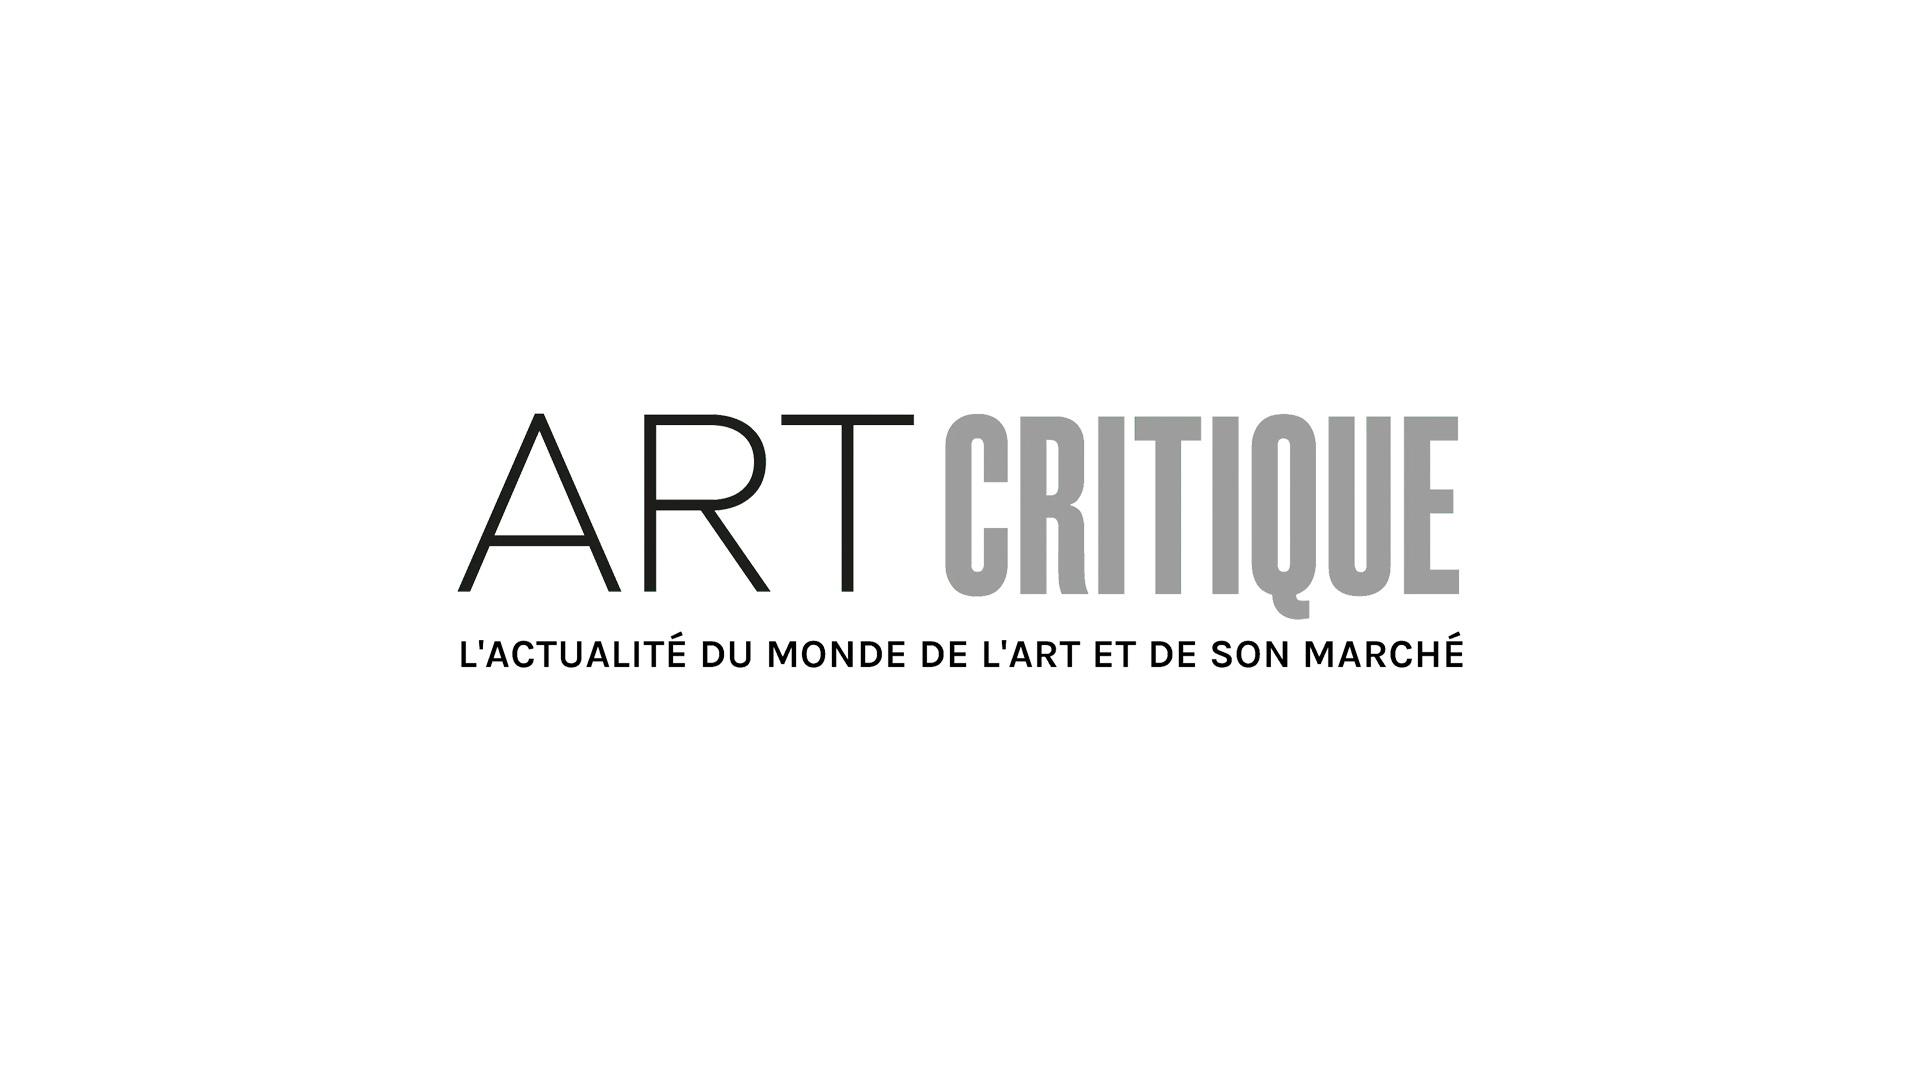 Les bijoux volés de Charles IX retrouvés?